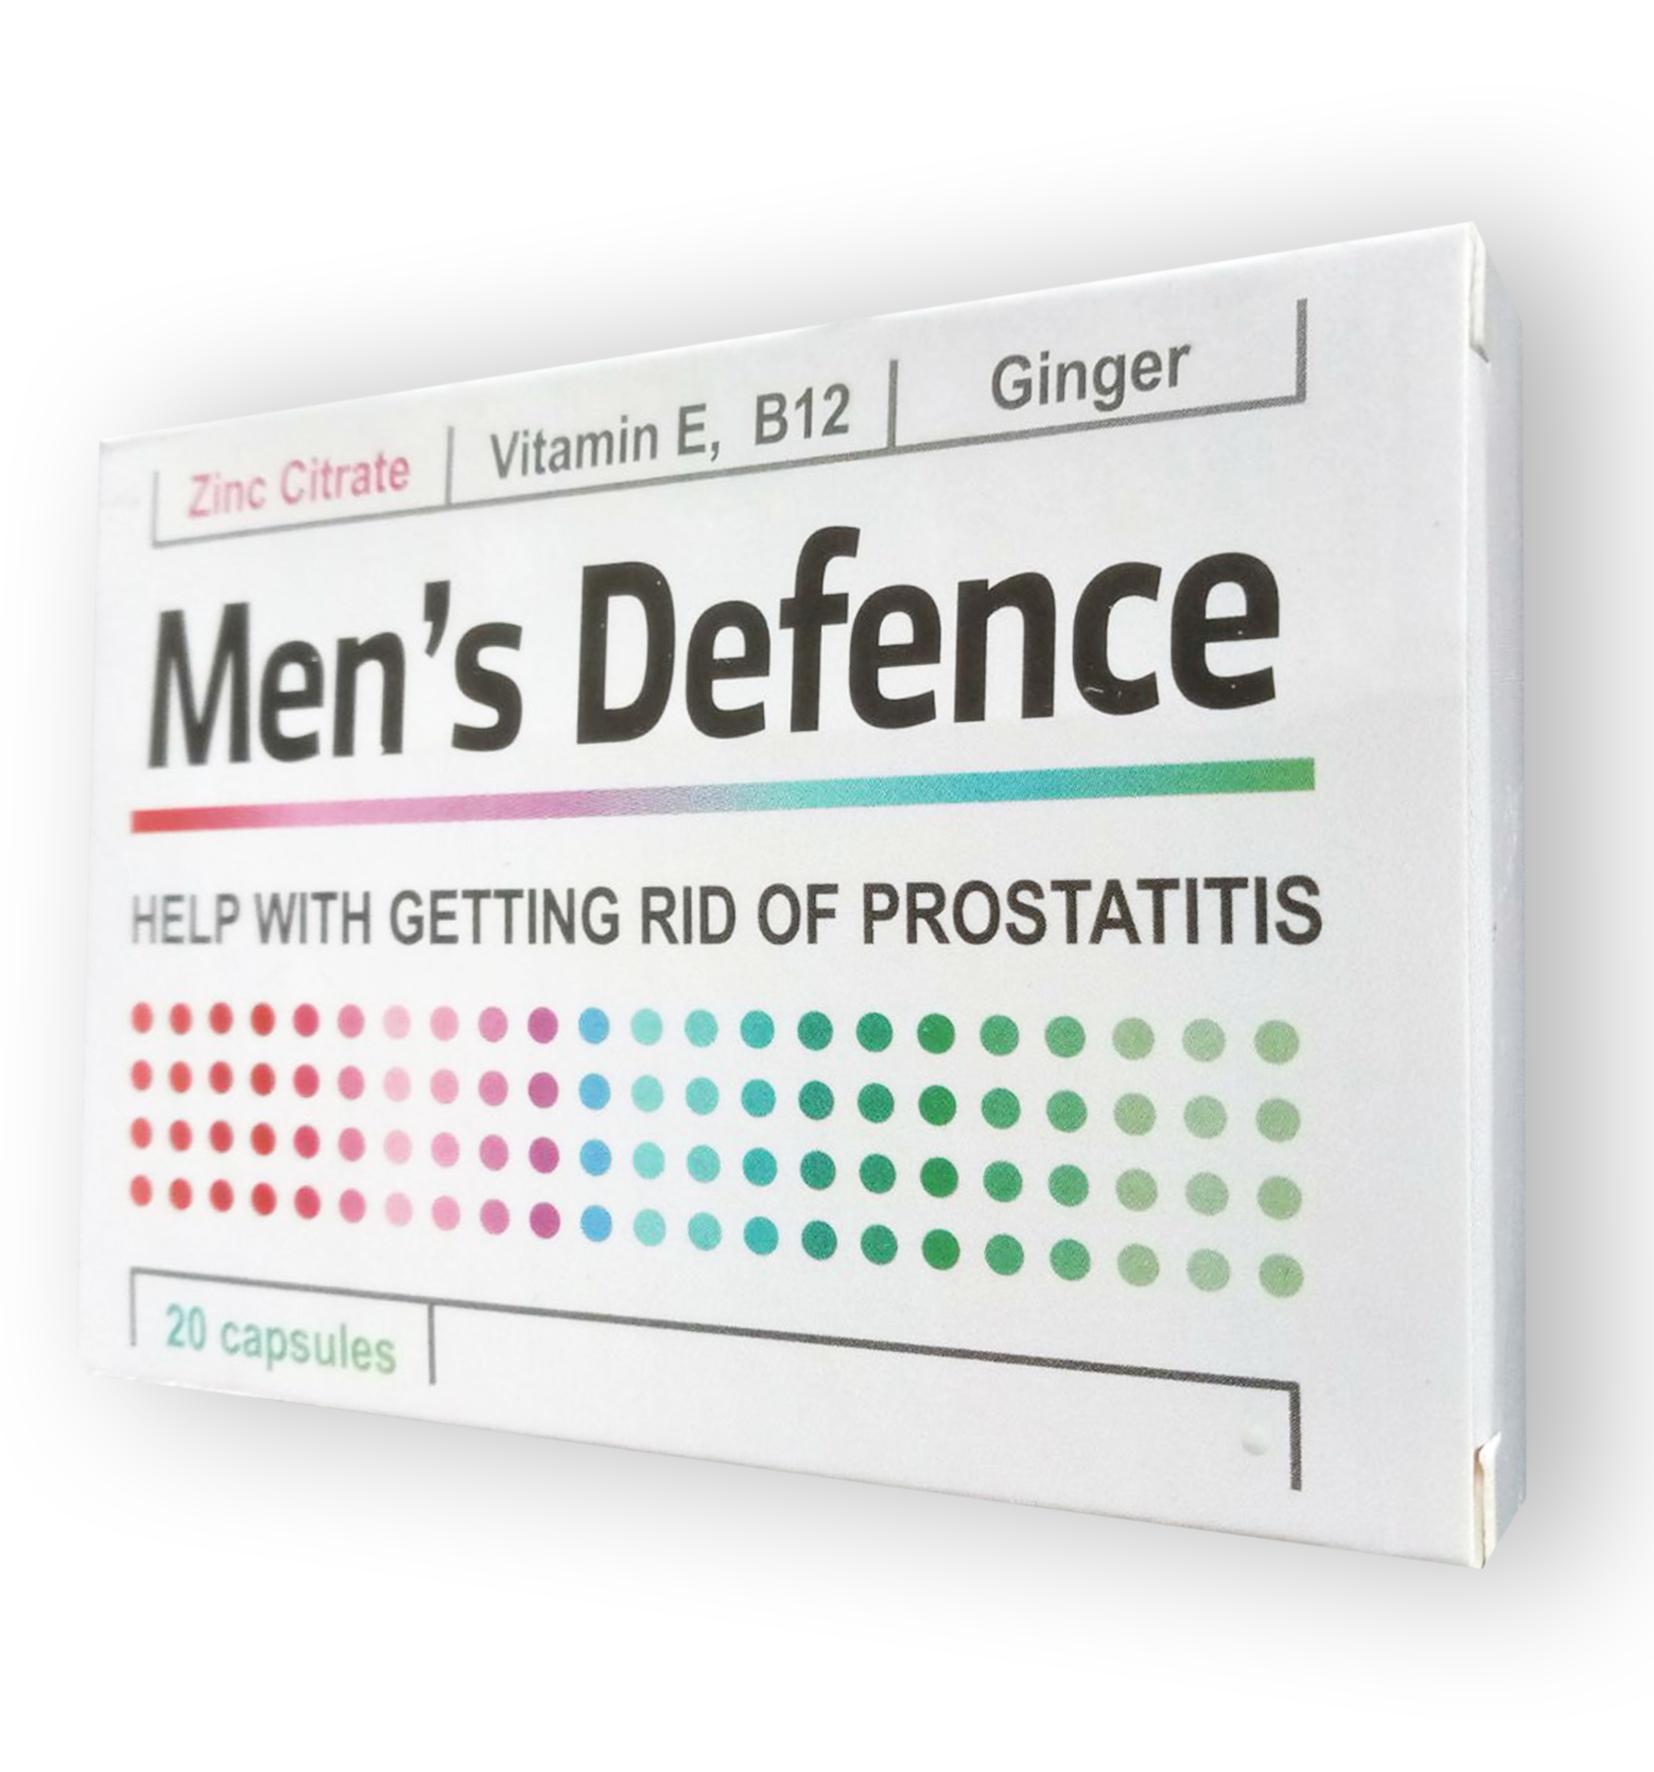 Men's Defence - Капсулы от простатита (Менс Дефенс) Men's Defence - Капсулы от простатита (Менс Дефенс)